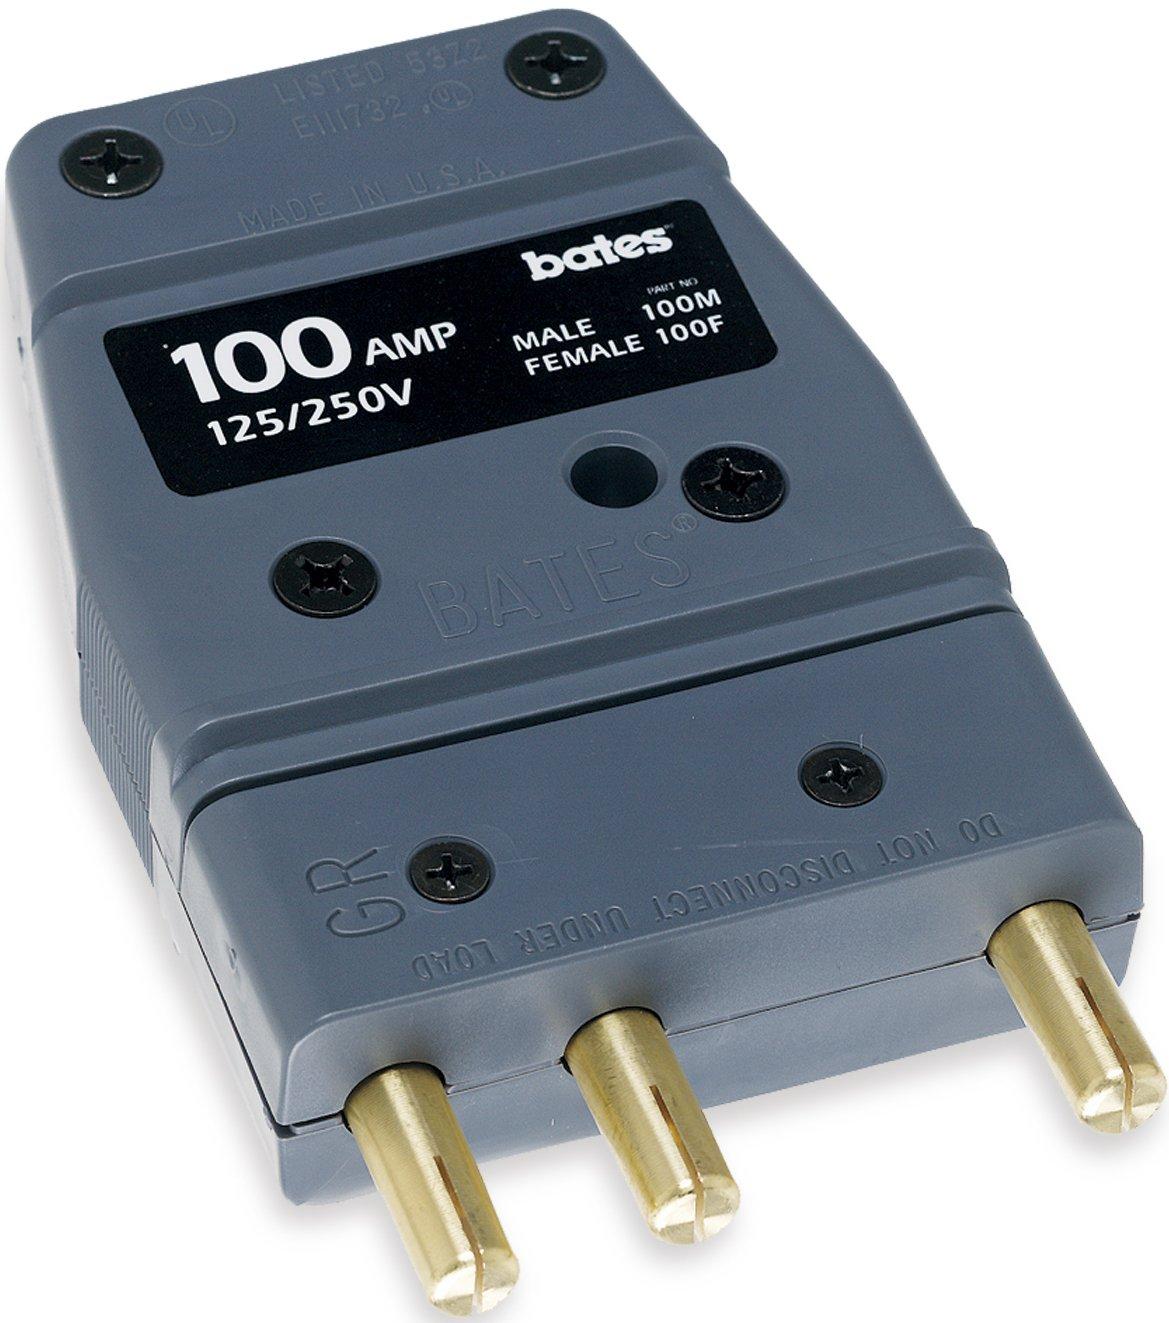 Marinco 100M Bates - Stage Pin 100 Amp, 125 Volt, Male Inline